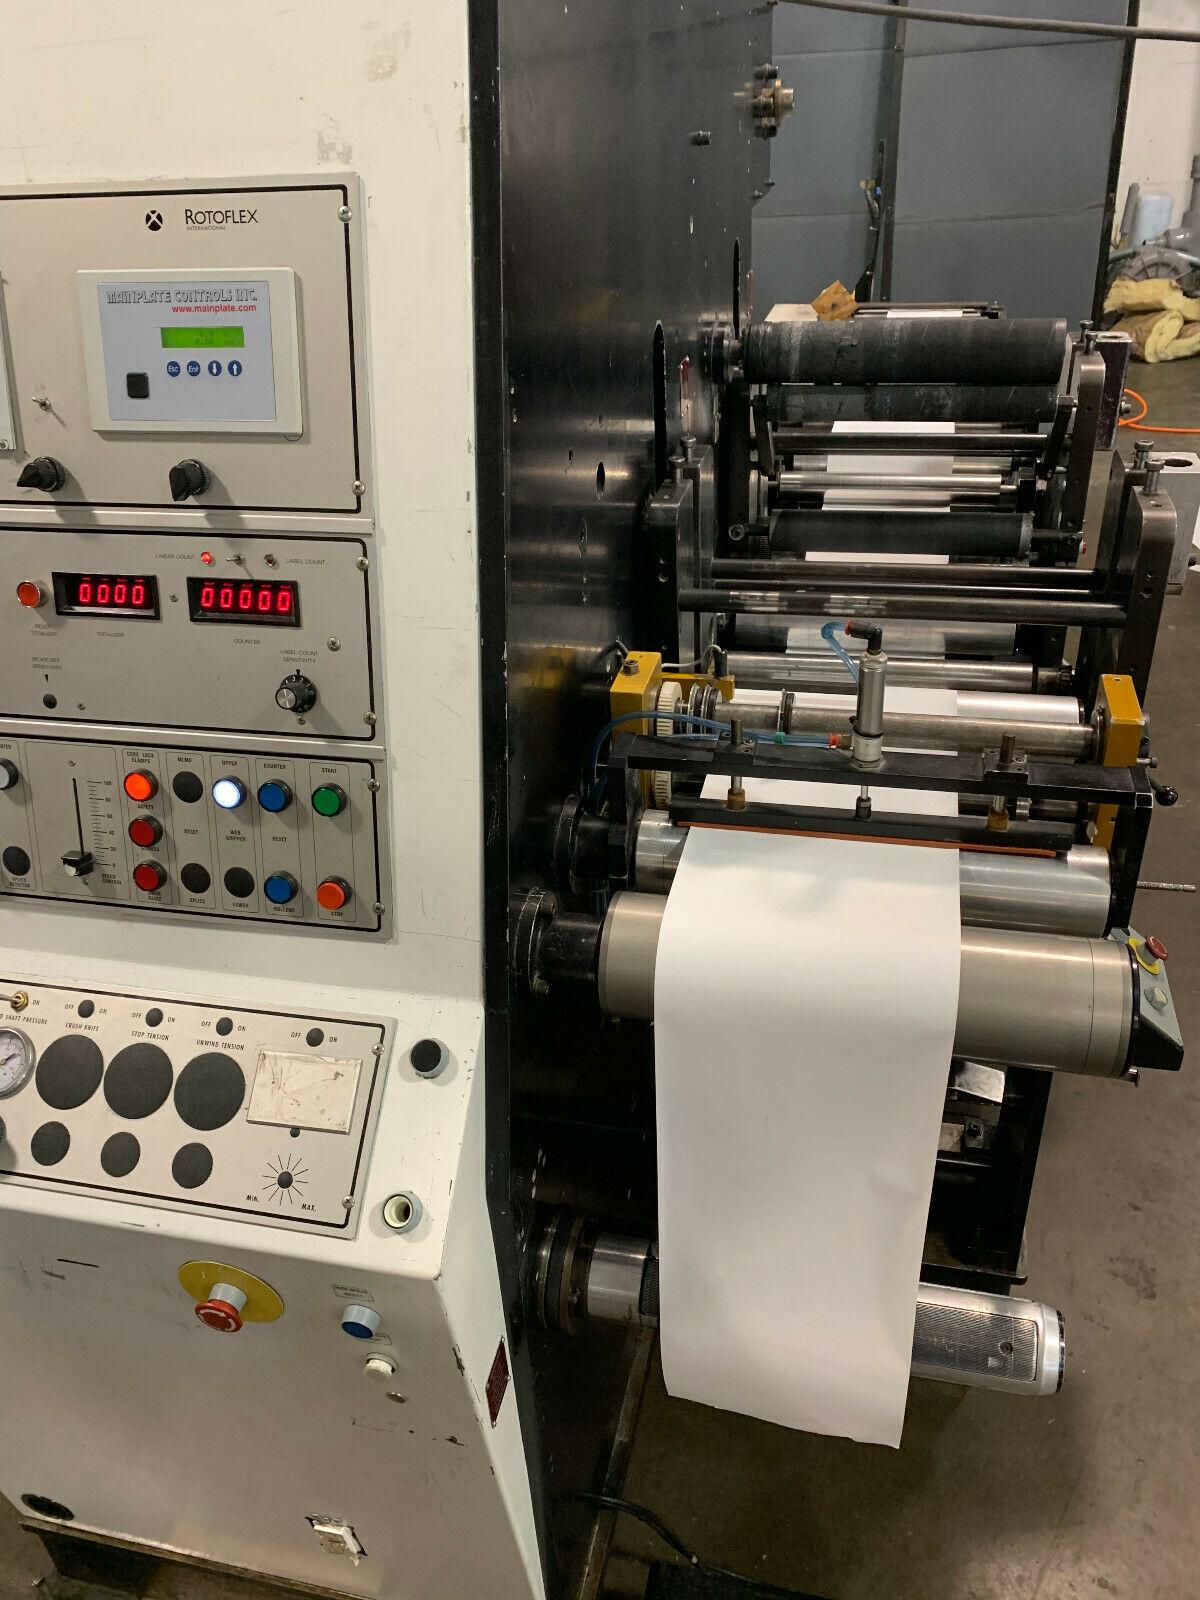 Rotoflex DLI330 - Used Flexo Printing Presses and Used Flexographic Equipment-5